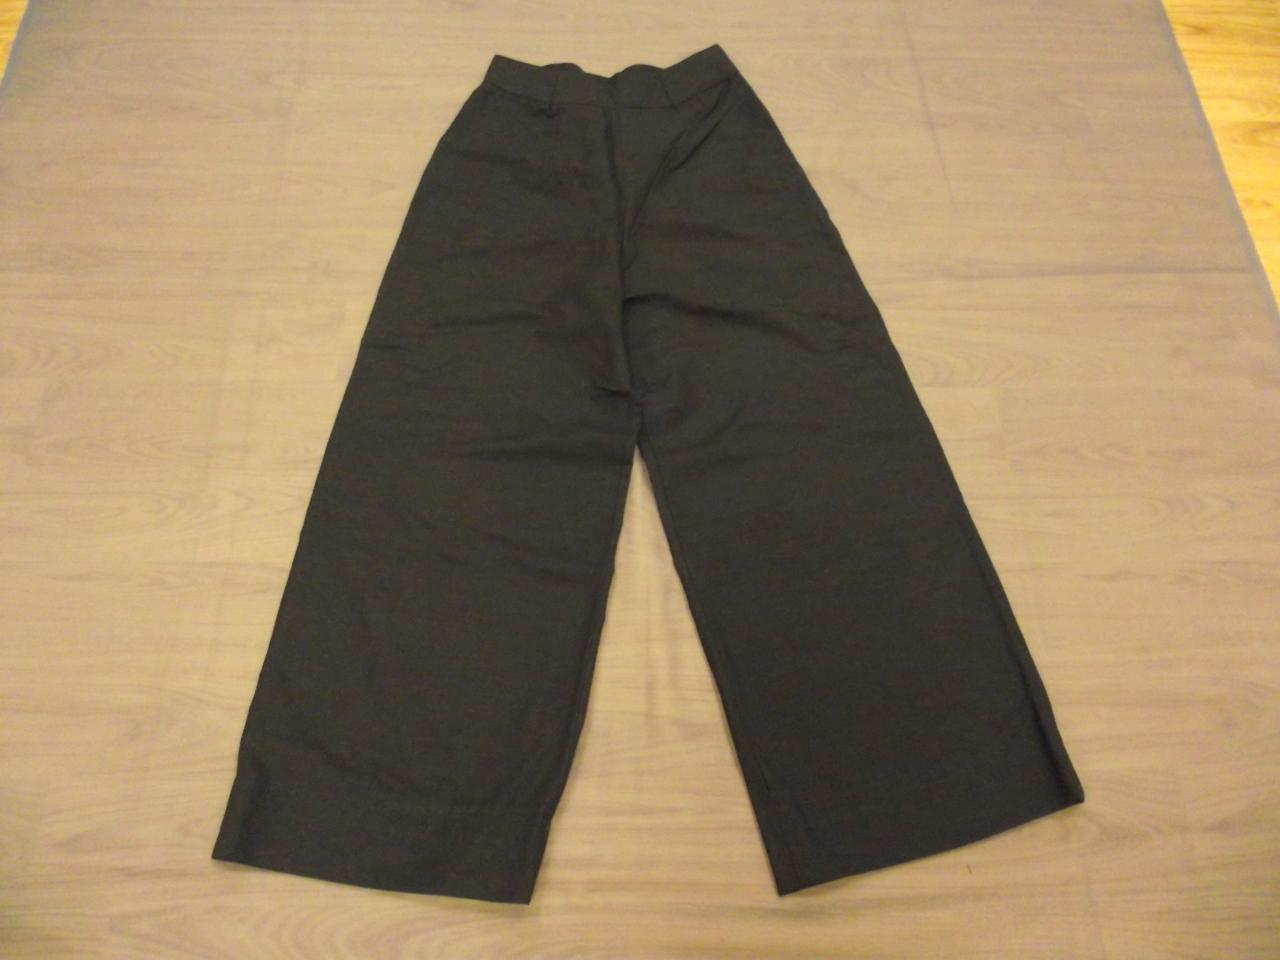 Pantalons noirs (x15) - 6/8 ans